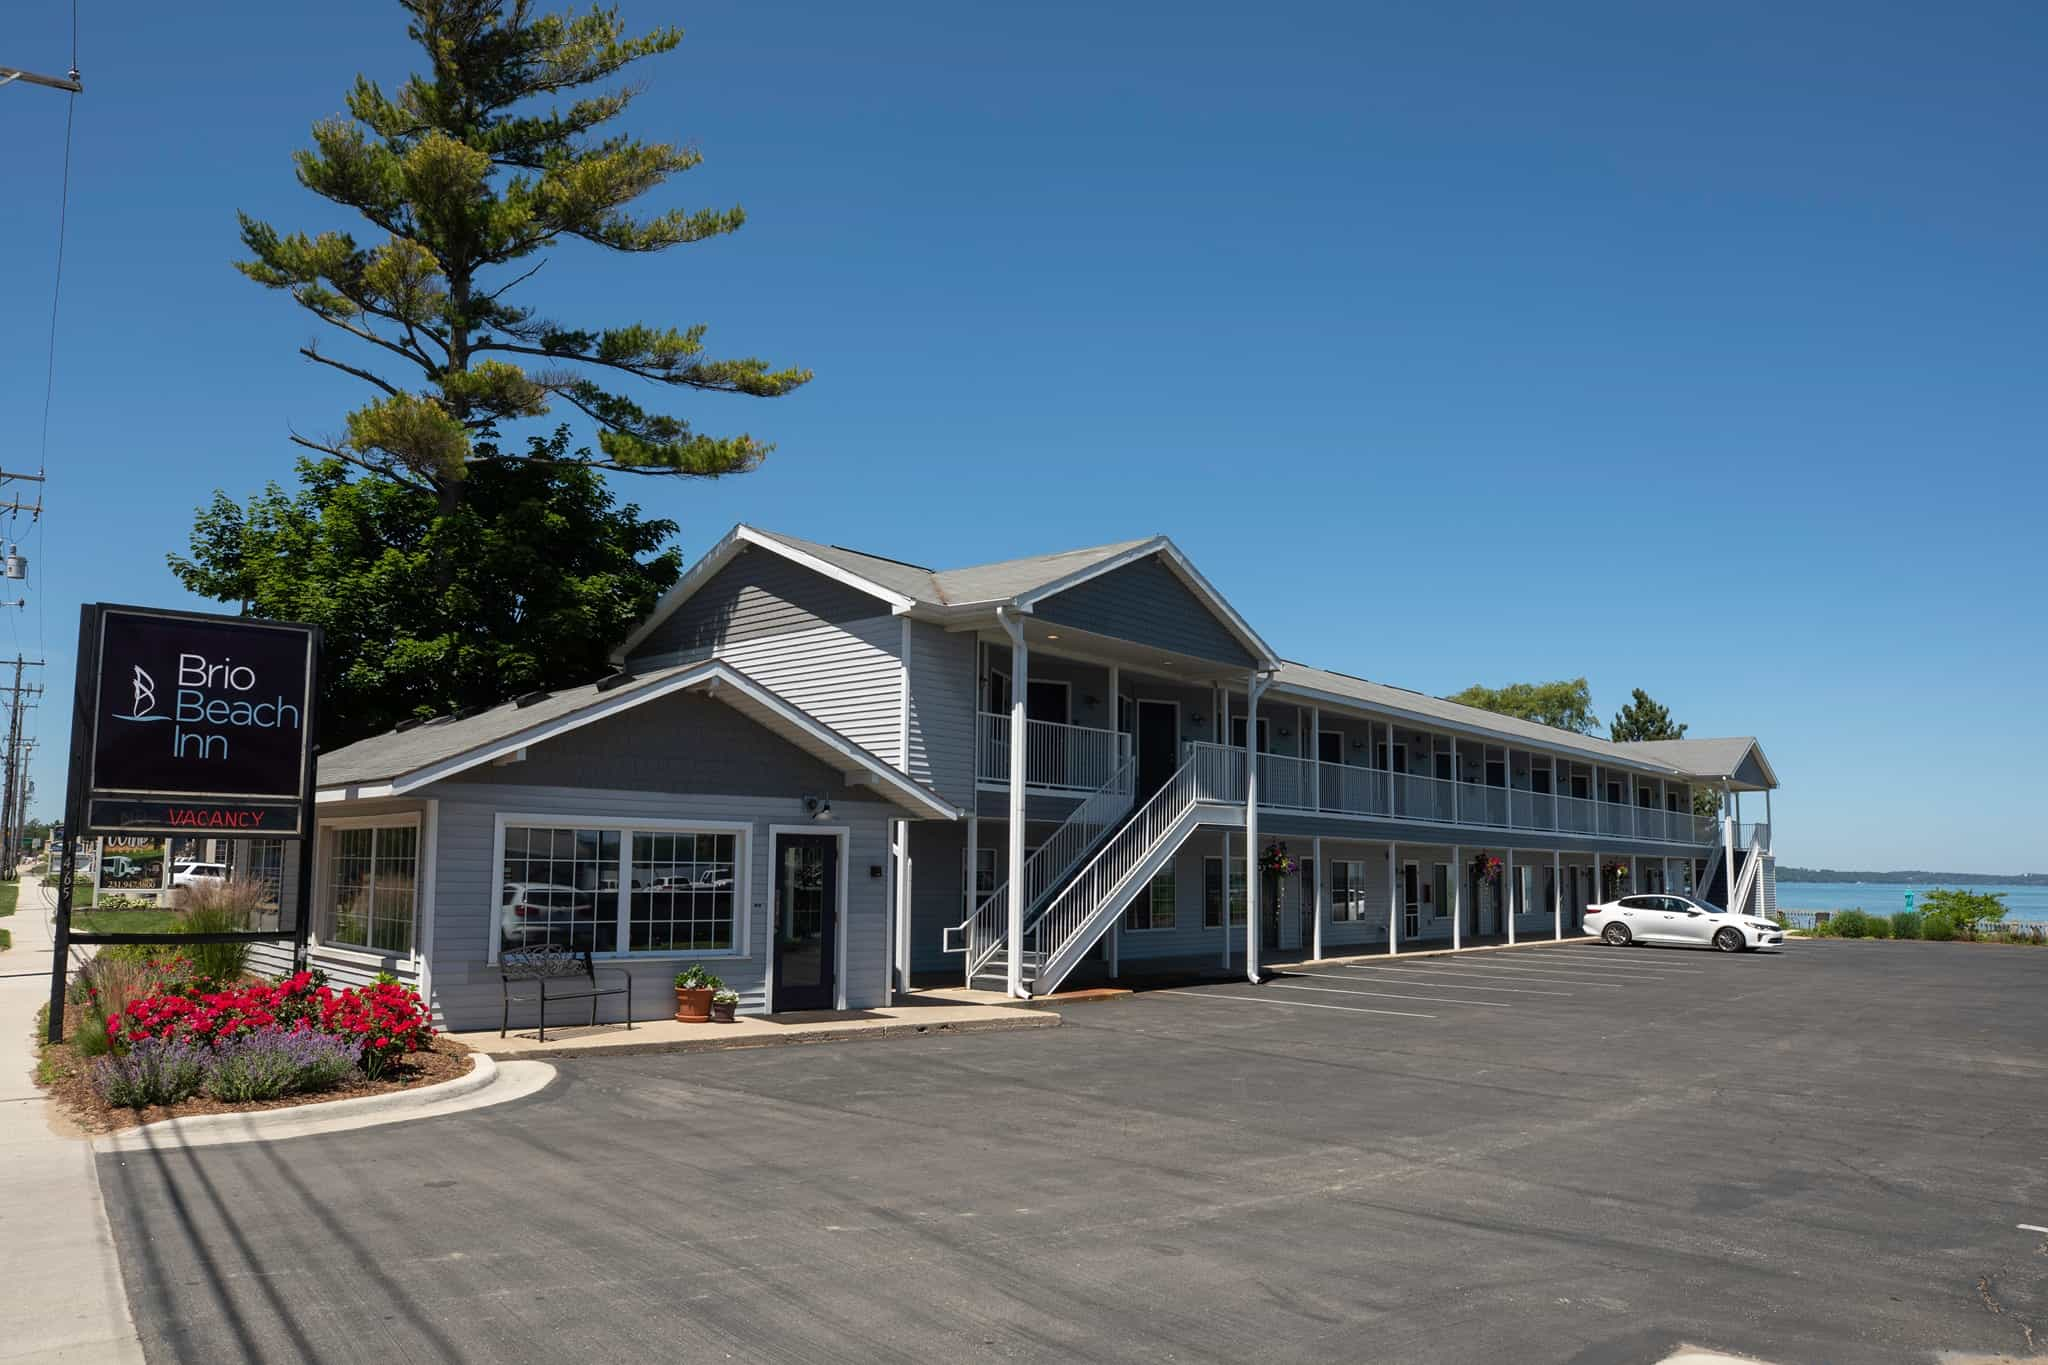 Brio Beach Inn in Traverse City Michigan